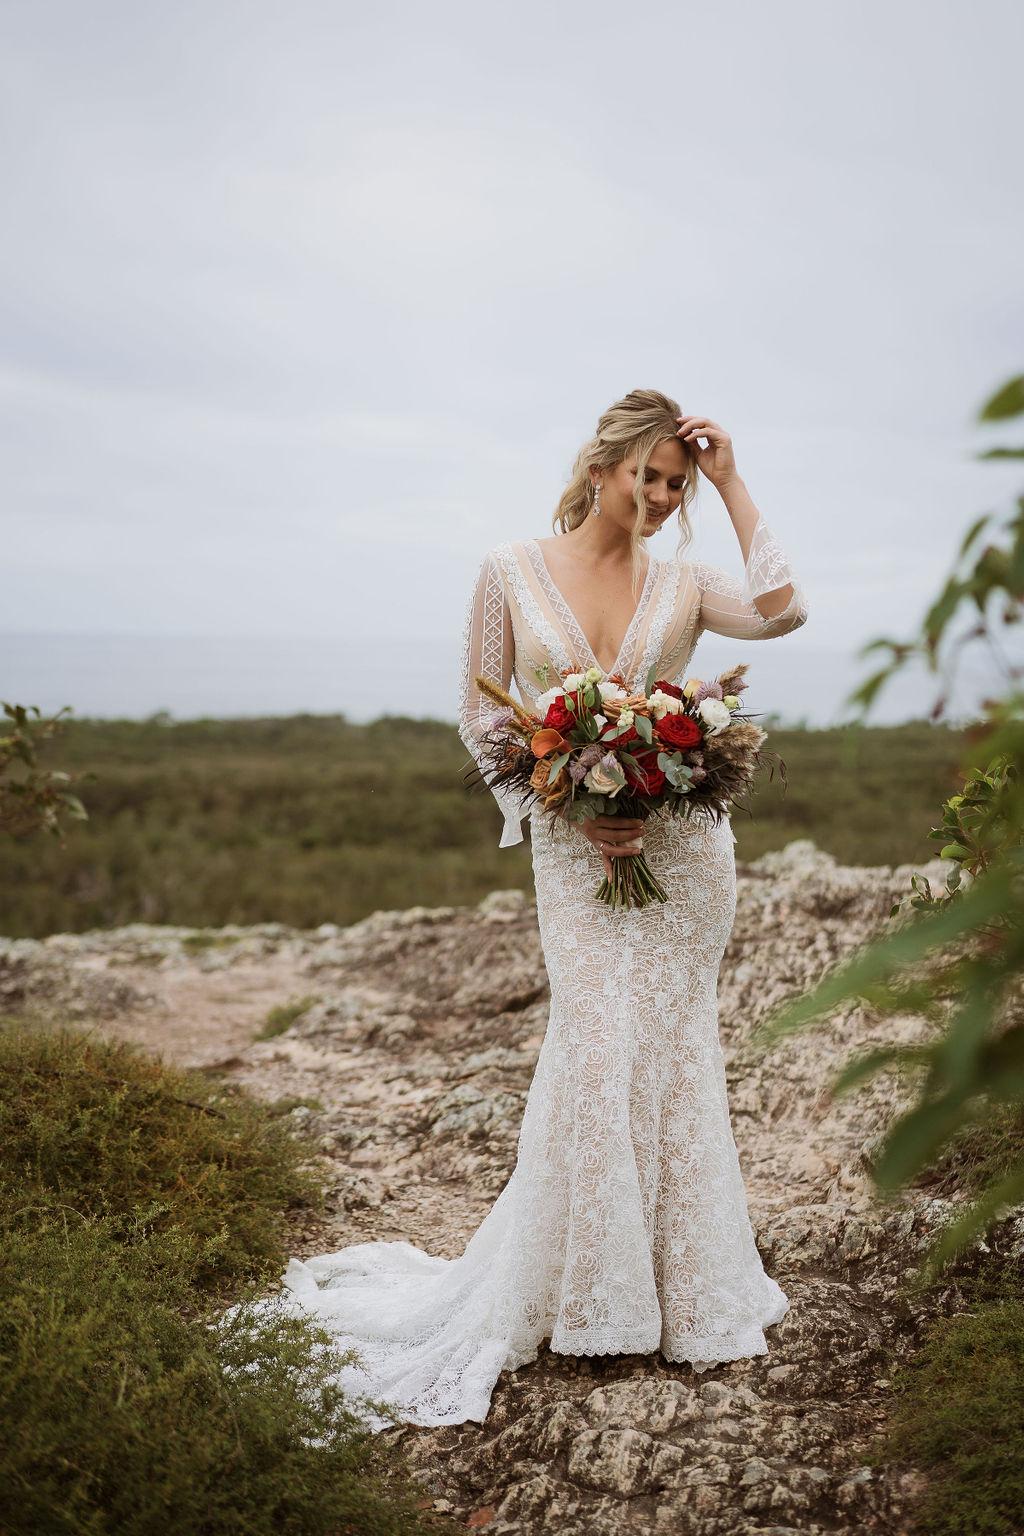 sunshine-coast-wedding-photography-terri-hanlon-photography-sunshine-brides-suncoast-flowers-allira-ashwell-17